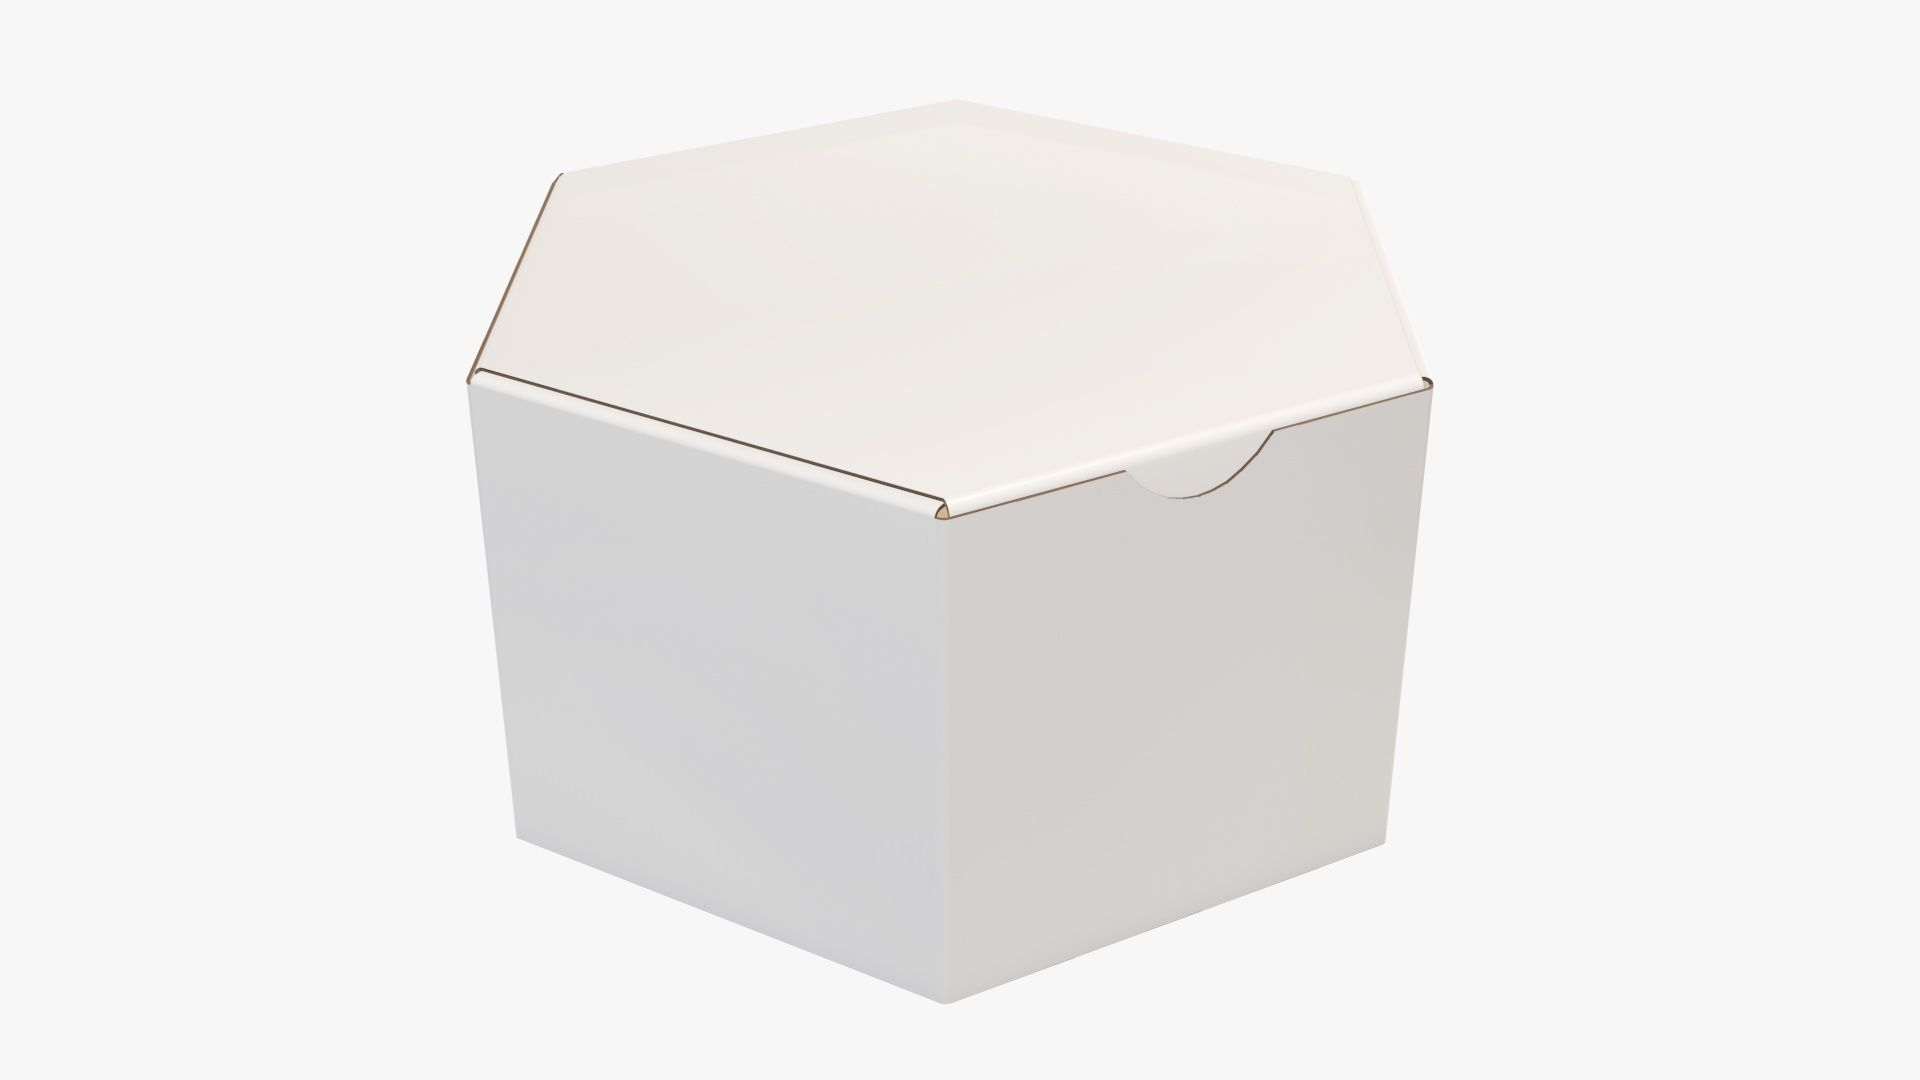 Paper box hexagonal closed 01 corrugated cardboard white